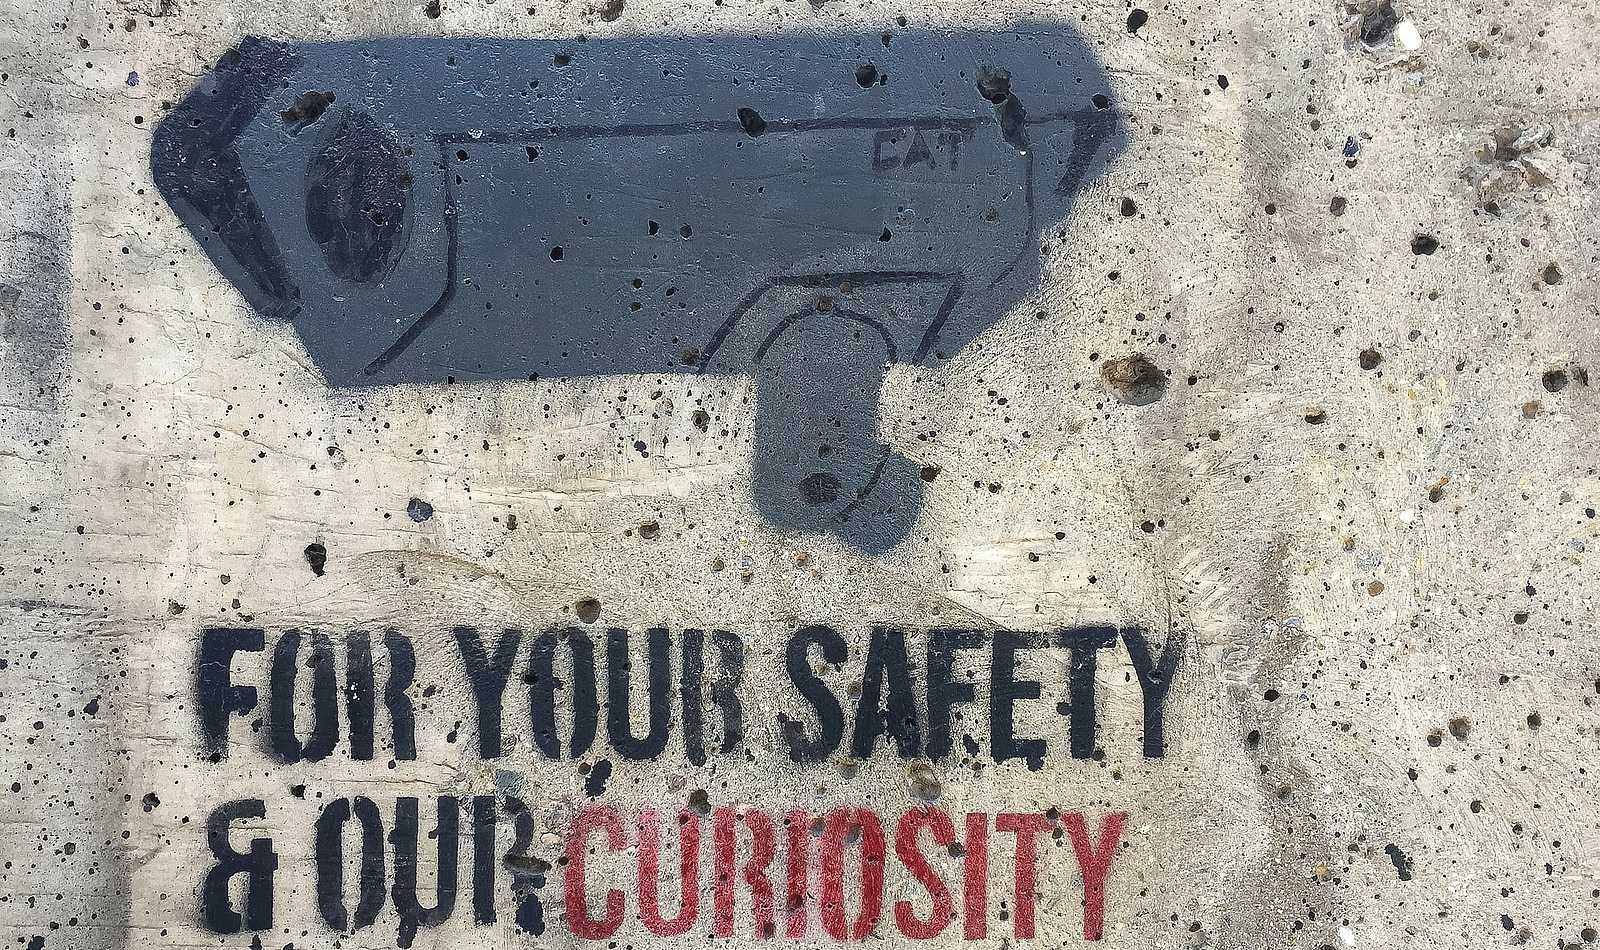 anti surveillance graffiti